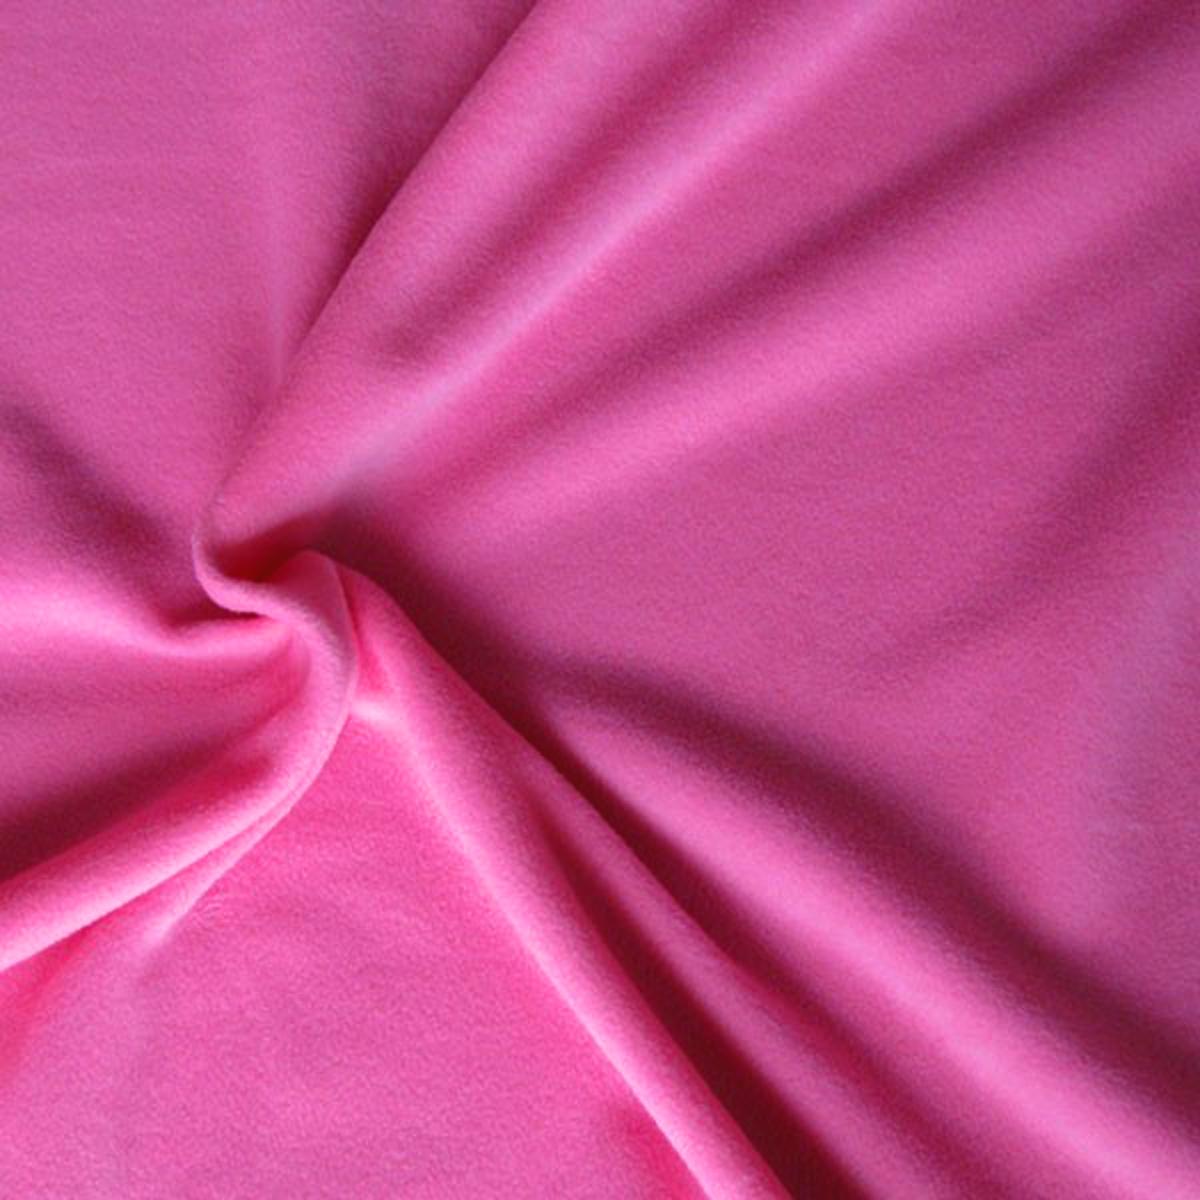 polar fleece stoffe fleece meterware antipilling pink stoffe stoffe uni fleece. Black Bedroom Furniture Sets. Home Design Ideas